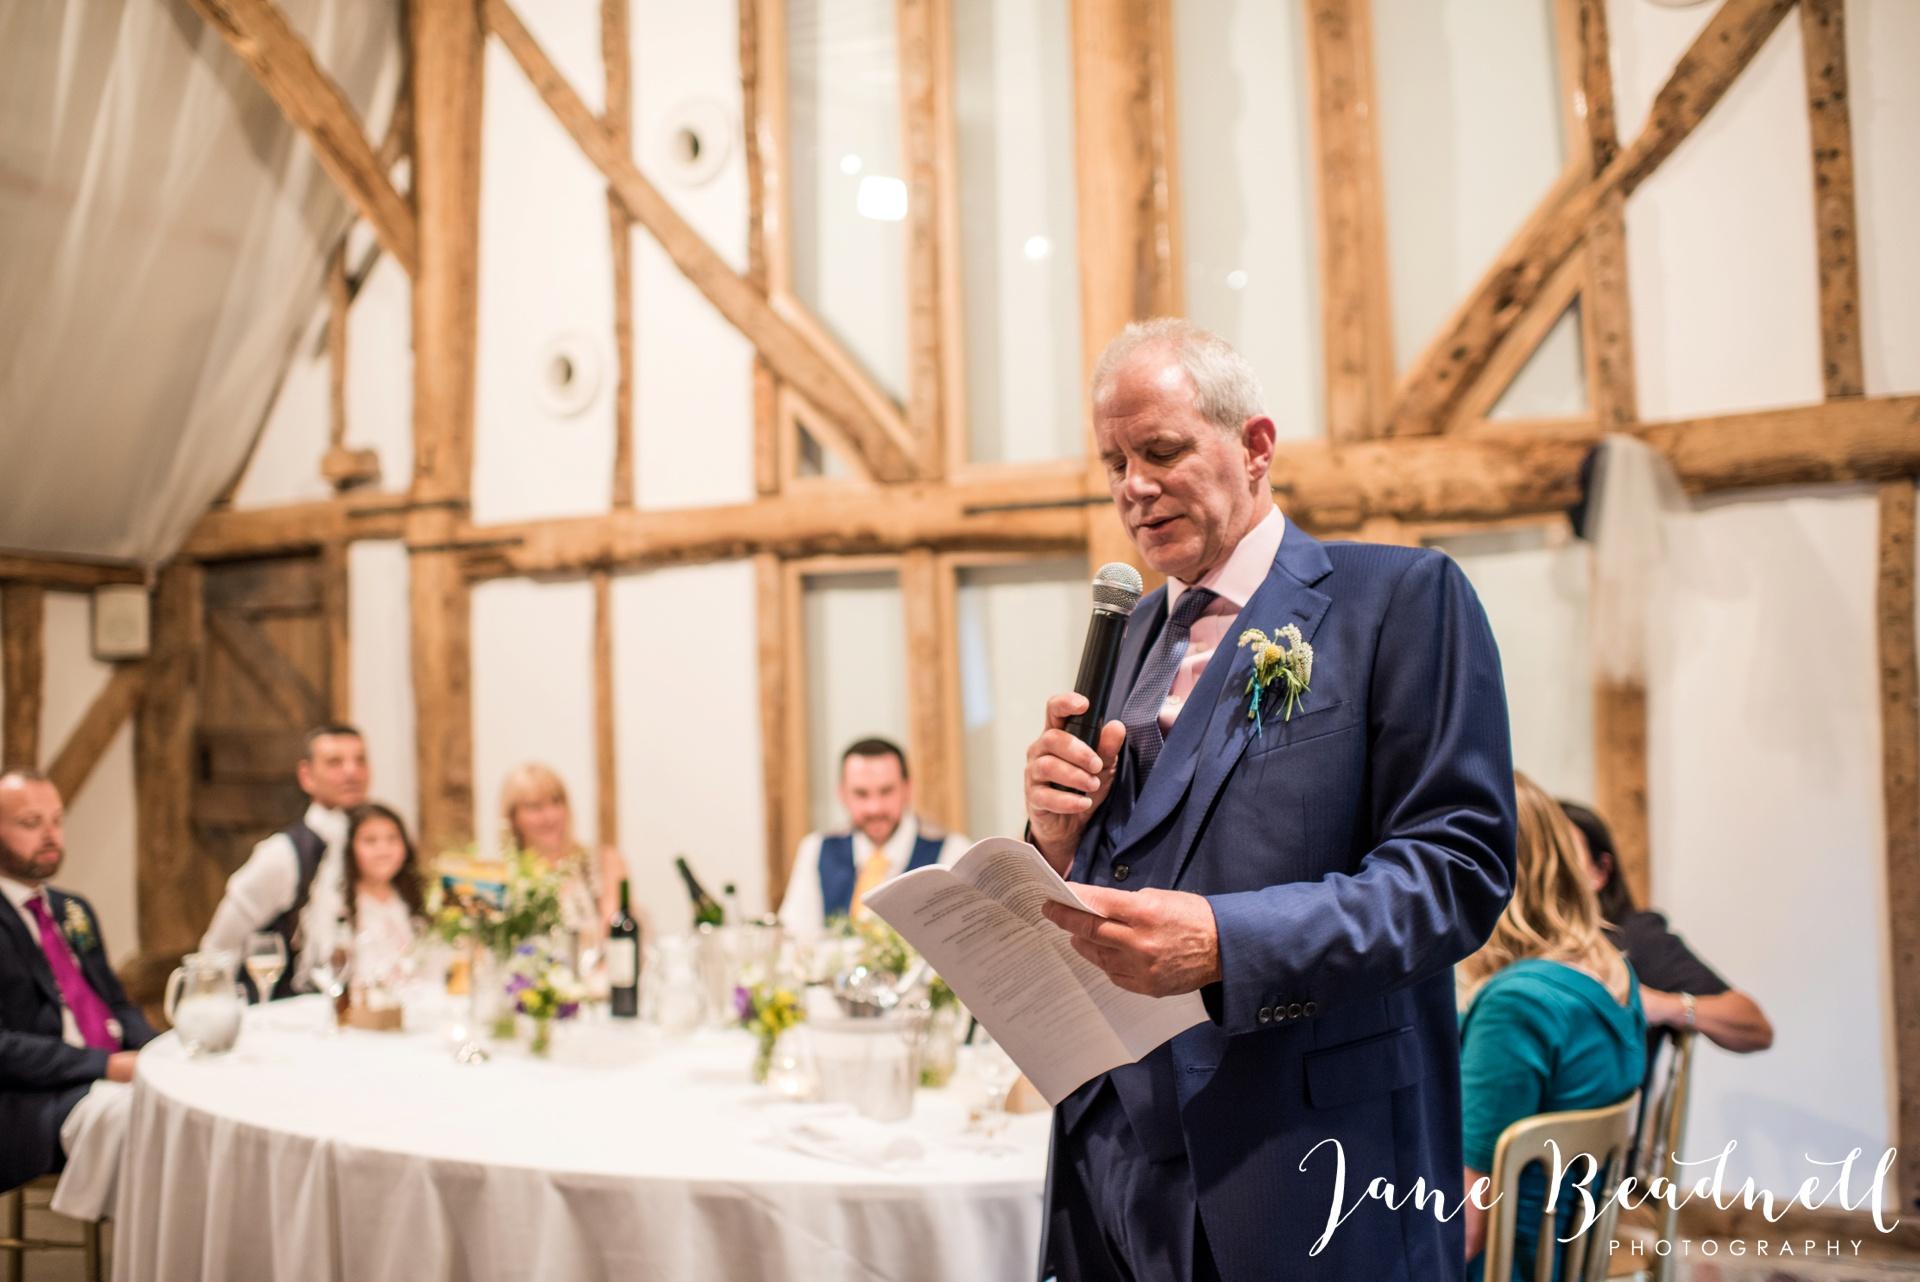 South Farm Wedding photography Hertfordshire by Jane Beadnell Photography fine art wedding photographer_0190